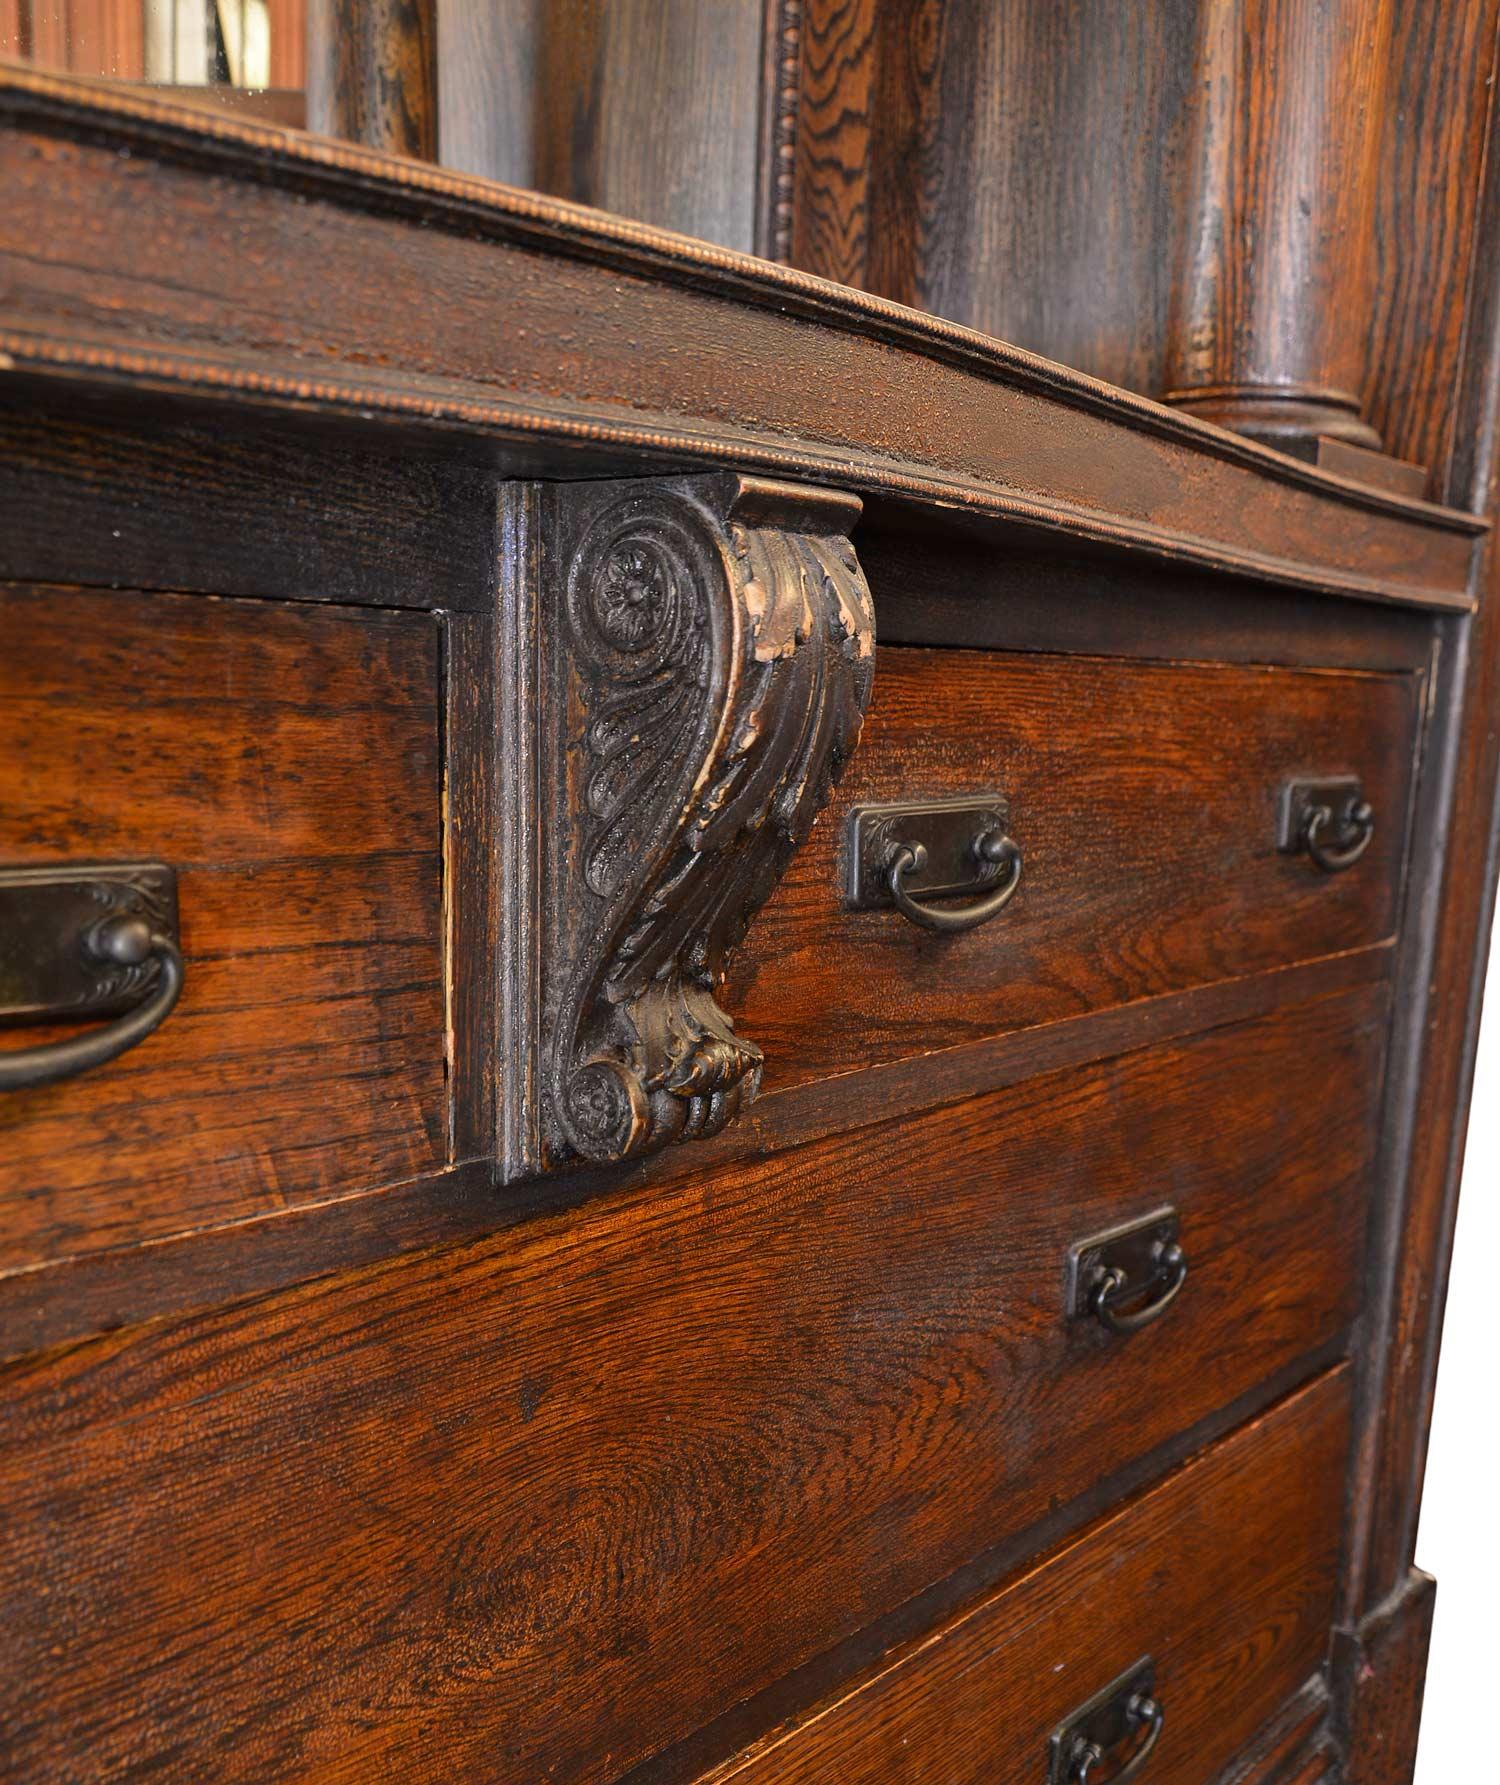 46038-oak-buffet-with-columns-corbel-detail.jpg